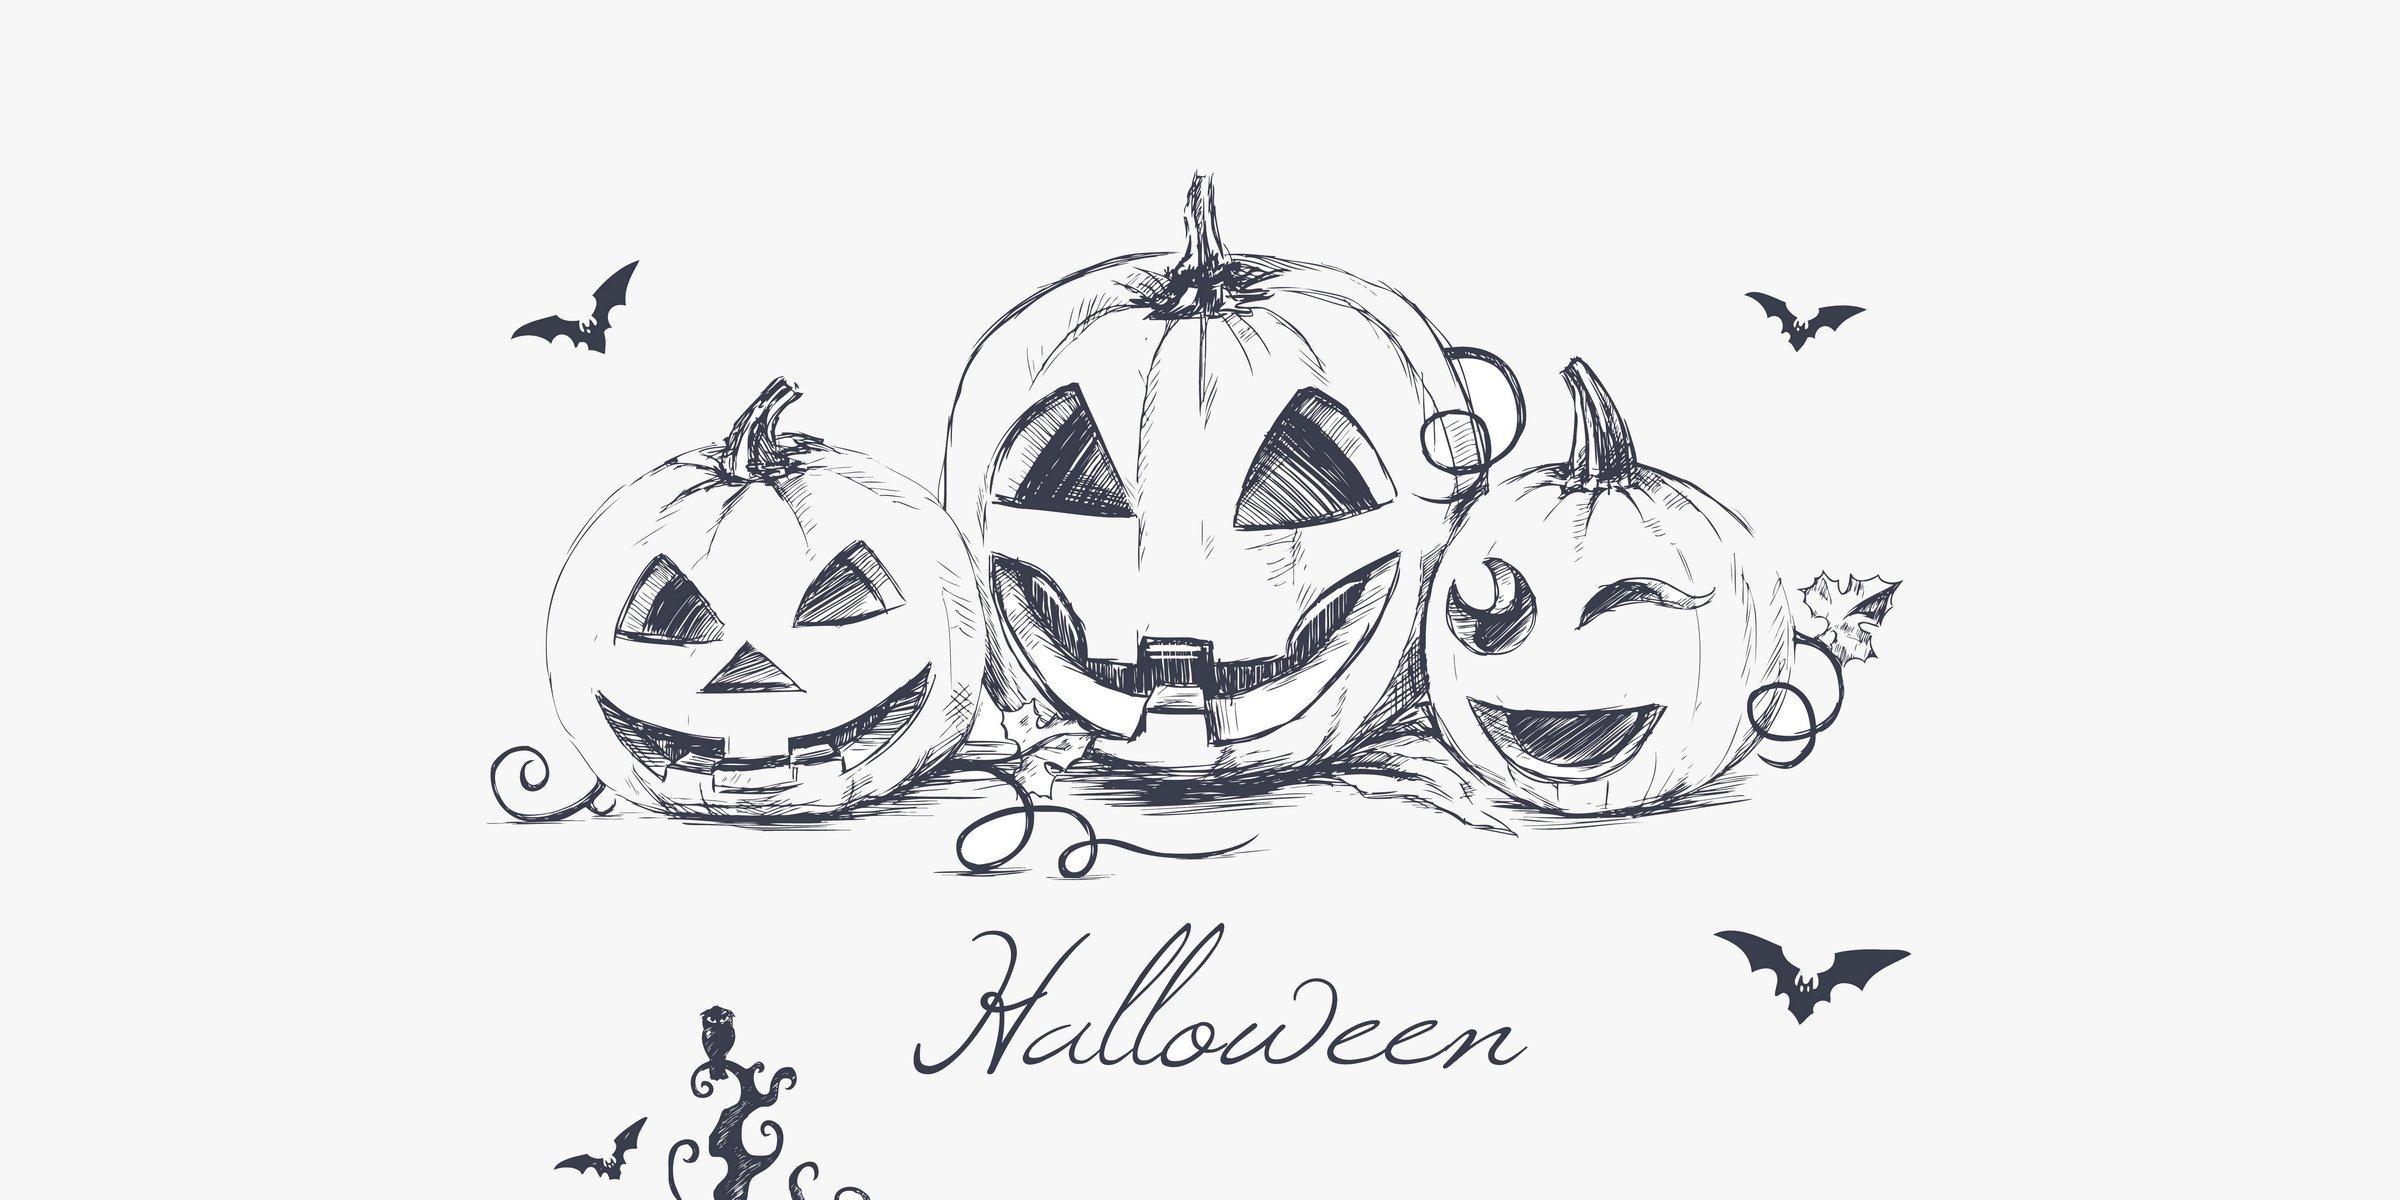 Drawn pumpkin pumkin Evil pumpkins bats halloween pumpkins